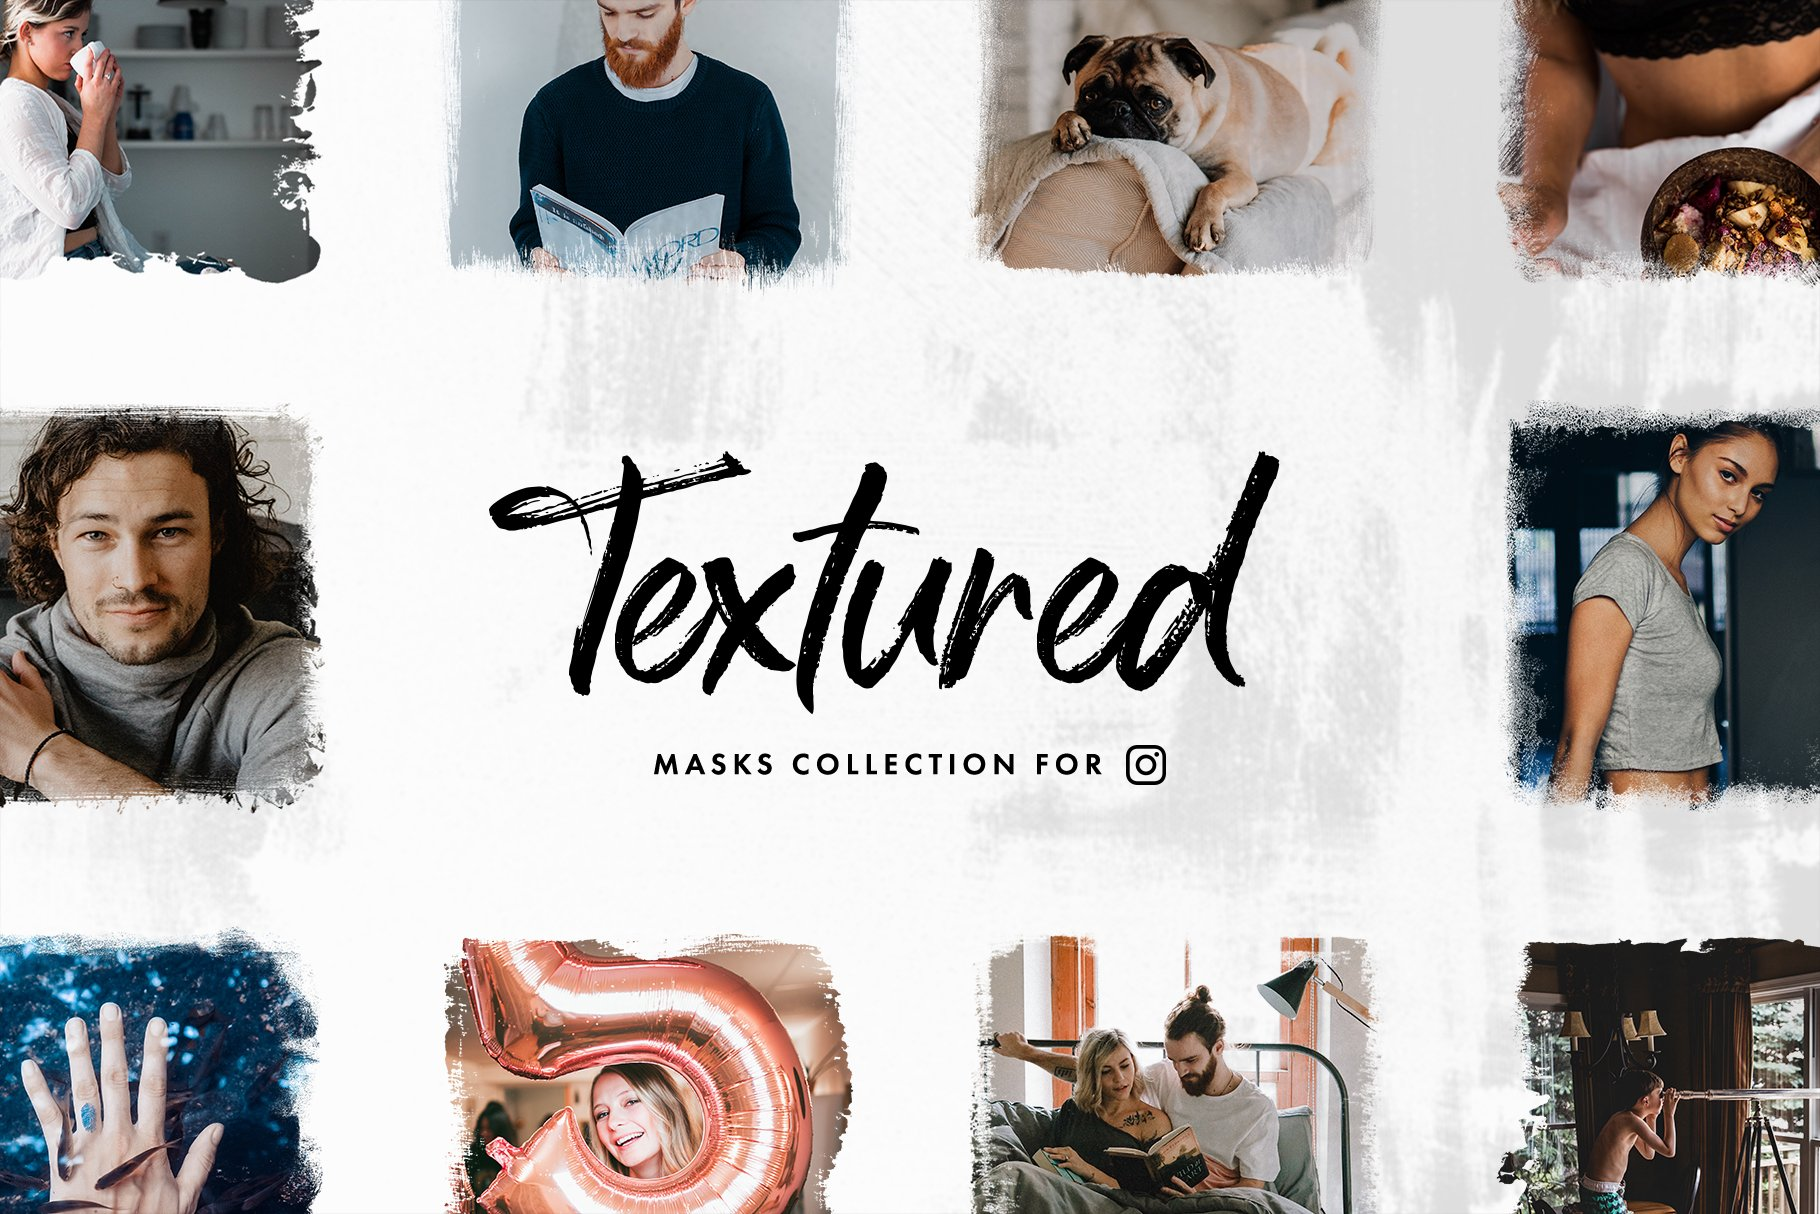 textured masks collection for instagram updates